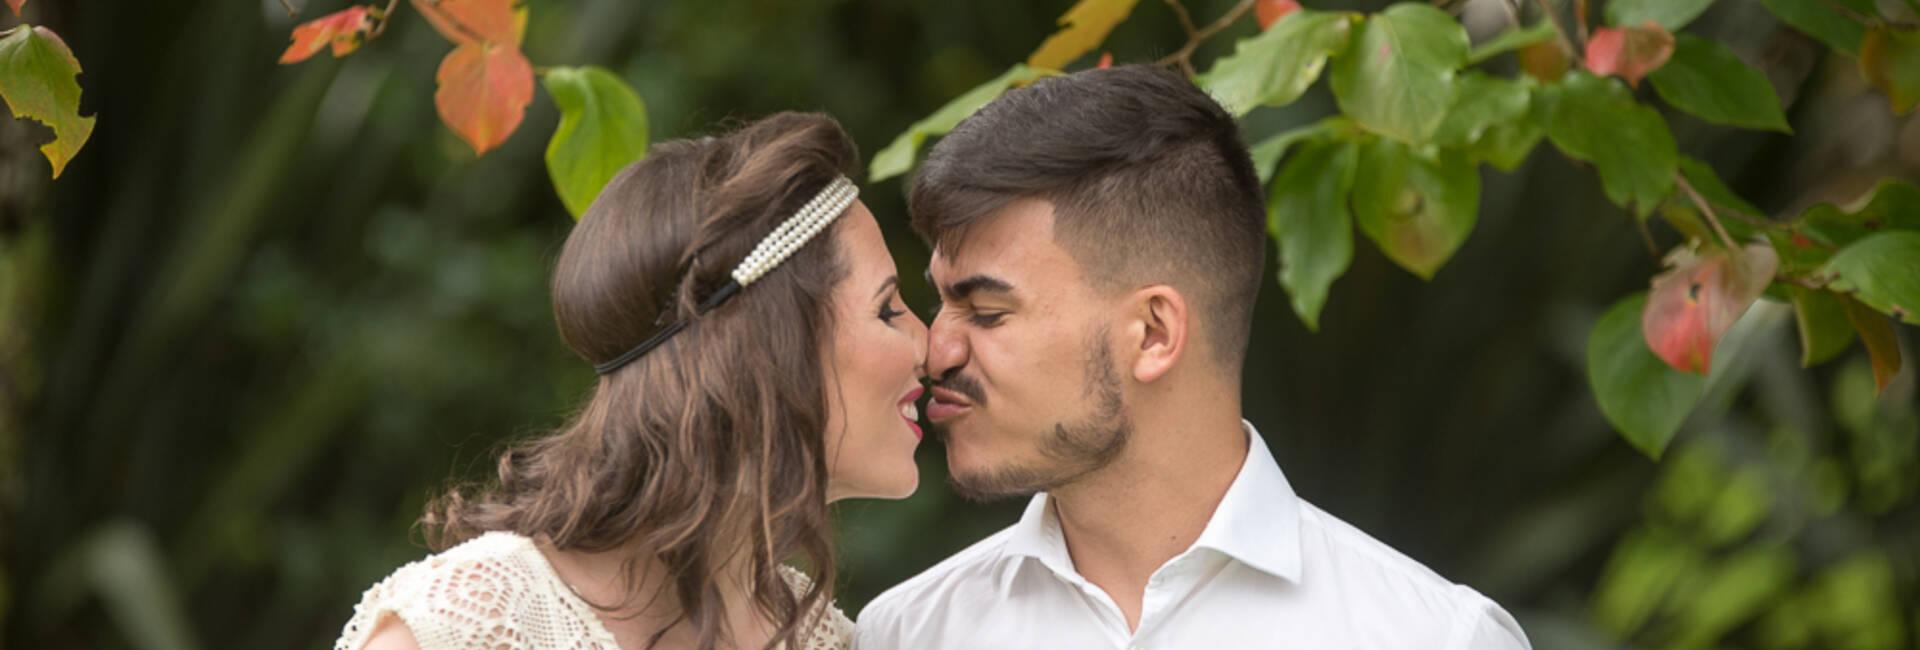 Pré-Wedding de Fran e Nicolas